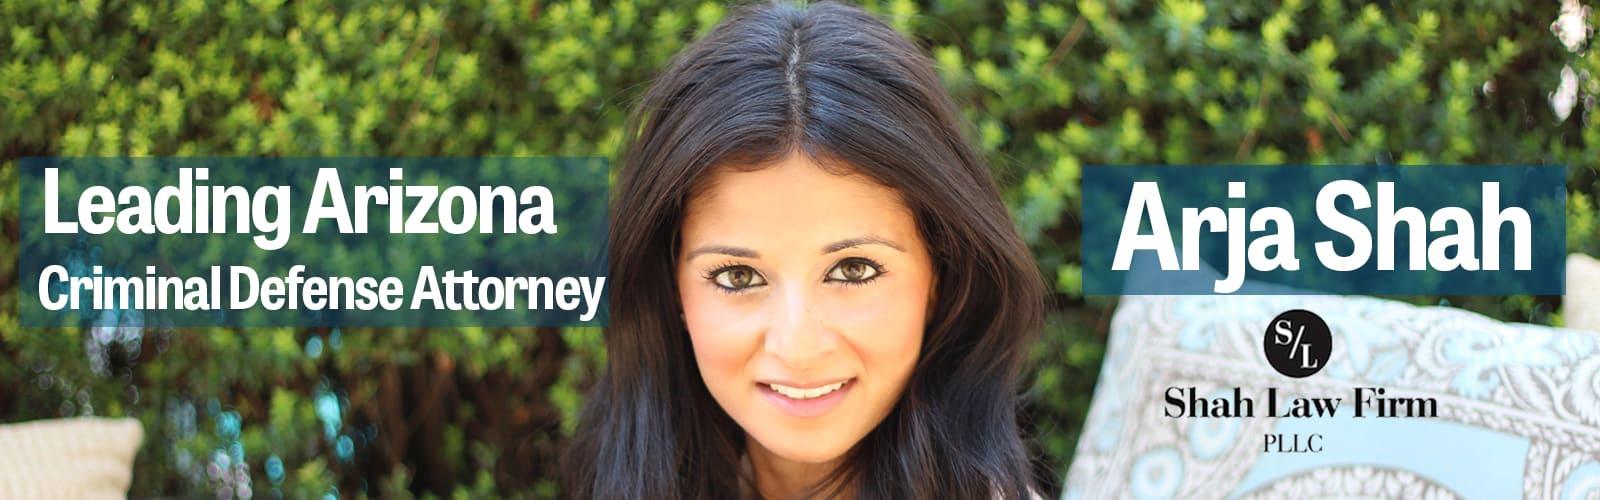 Phoenix Criminal Defense & DUI Attorney Arja Shah